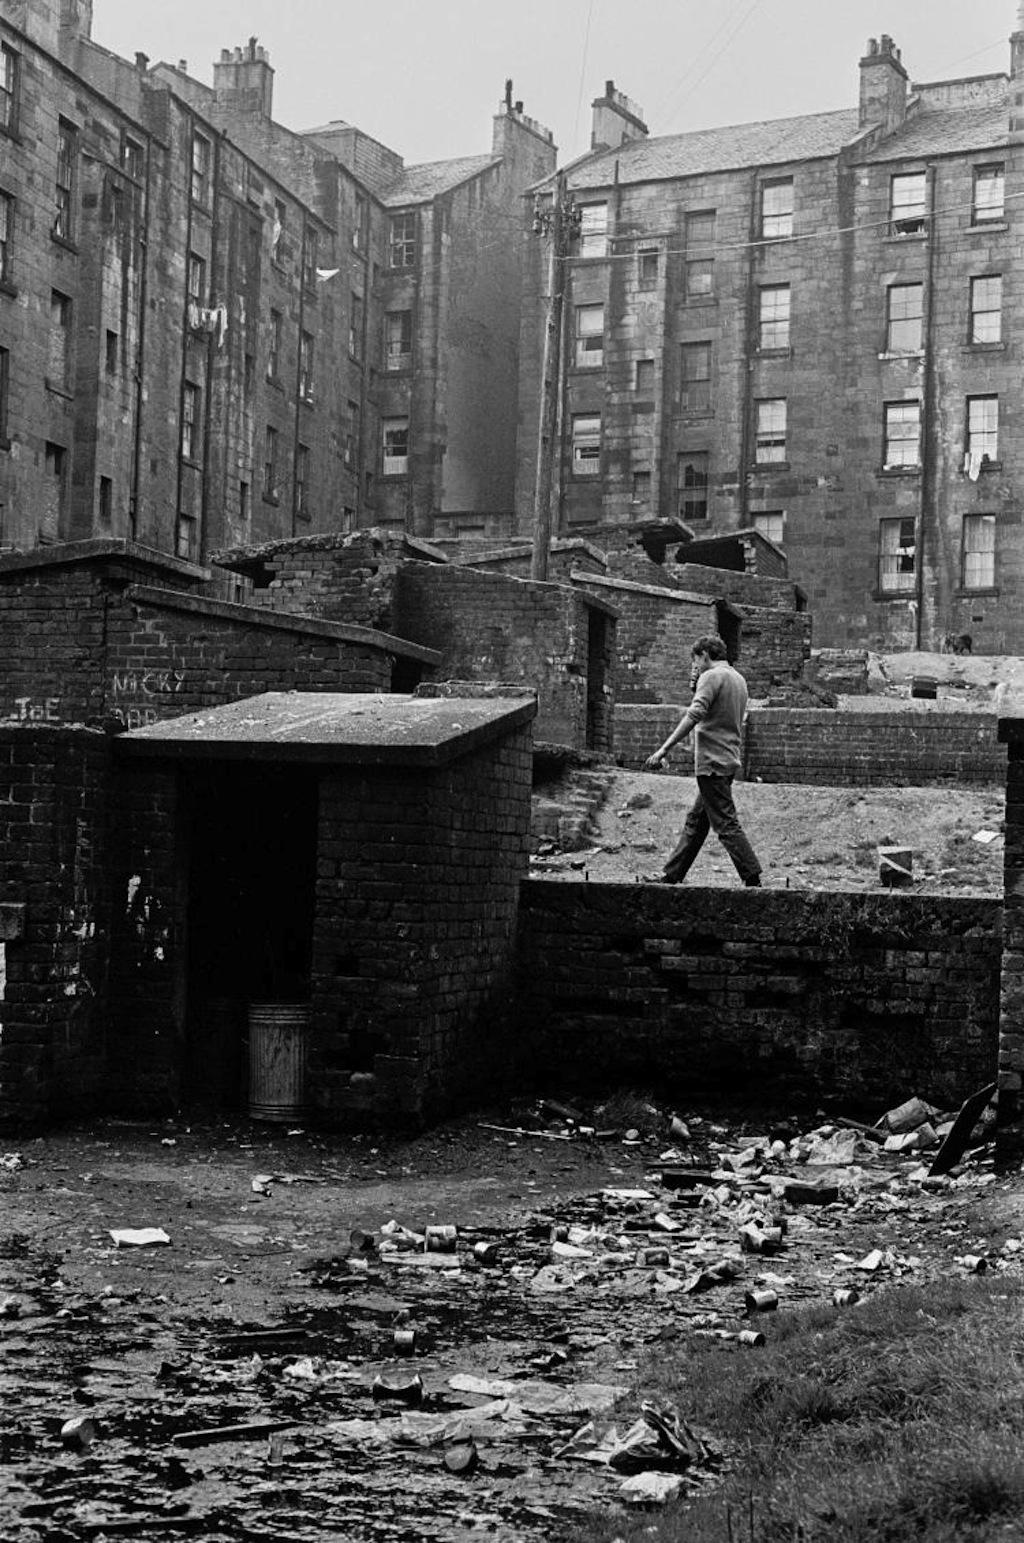 Tenement-backs-Glasgow-1971-386-17a